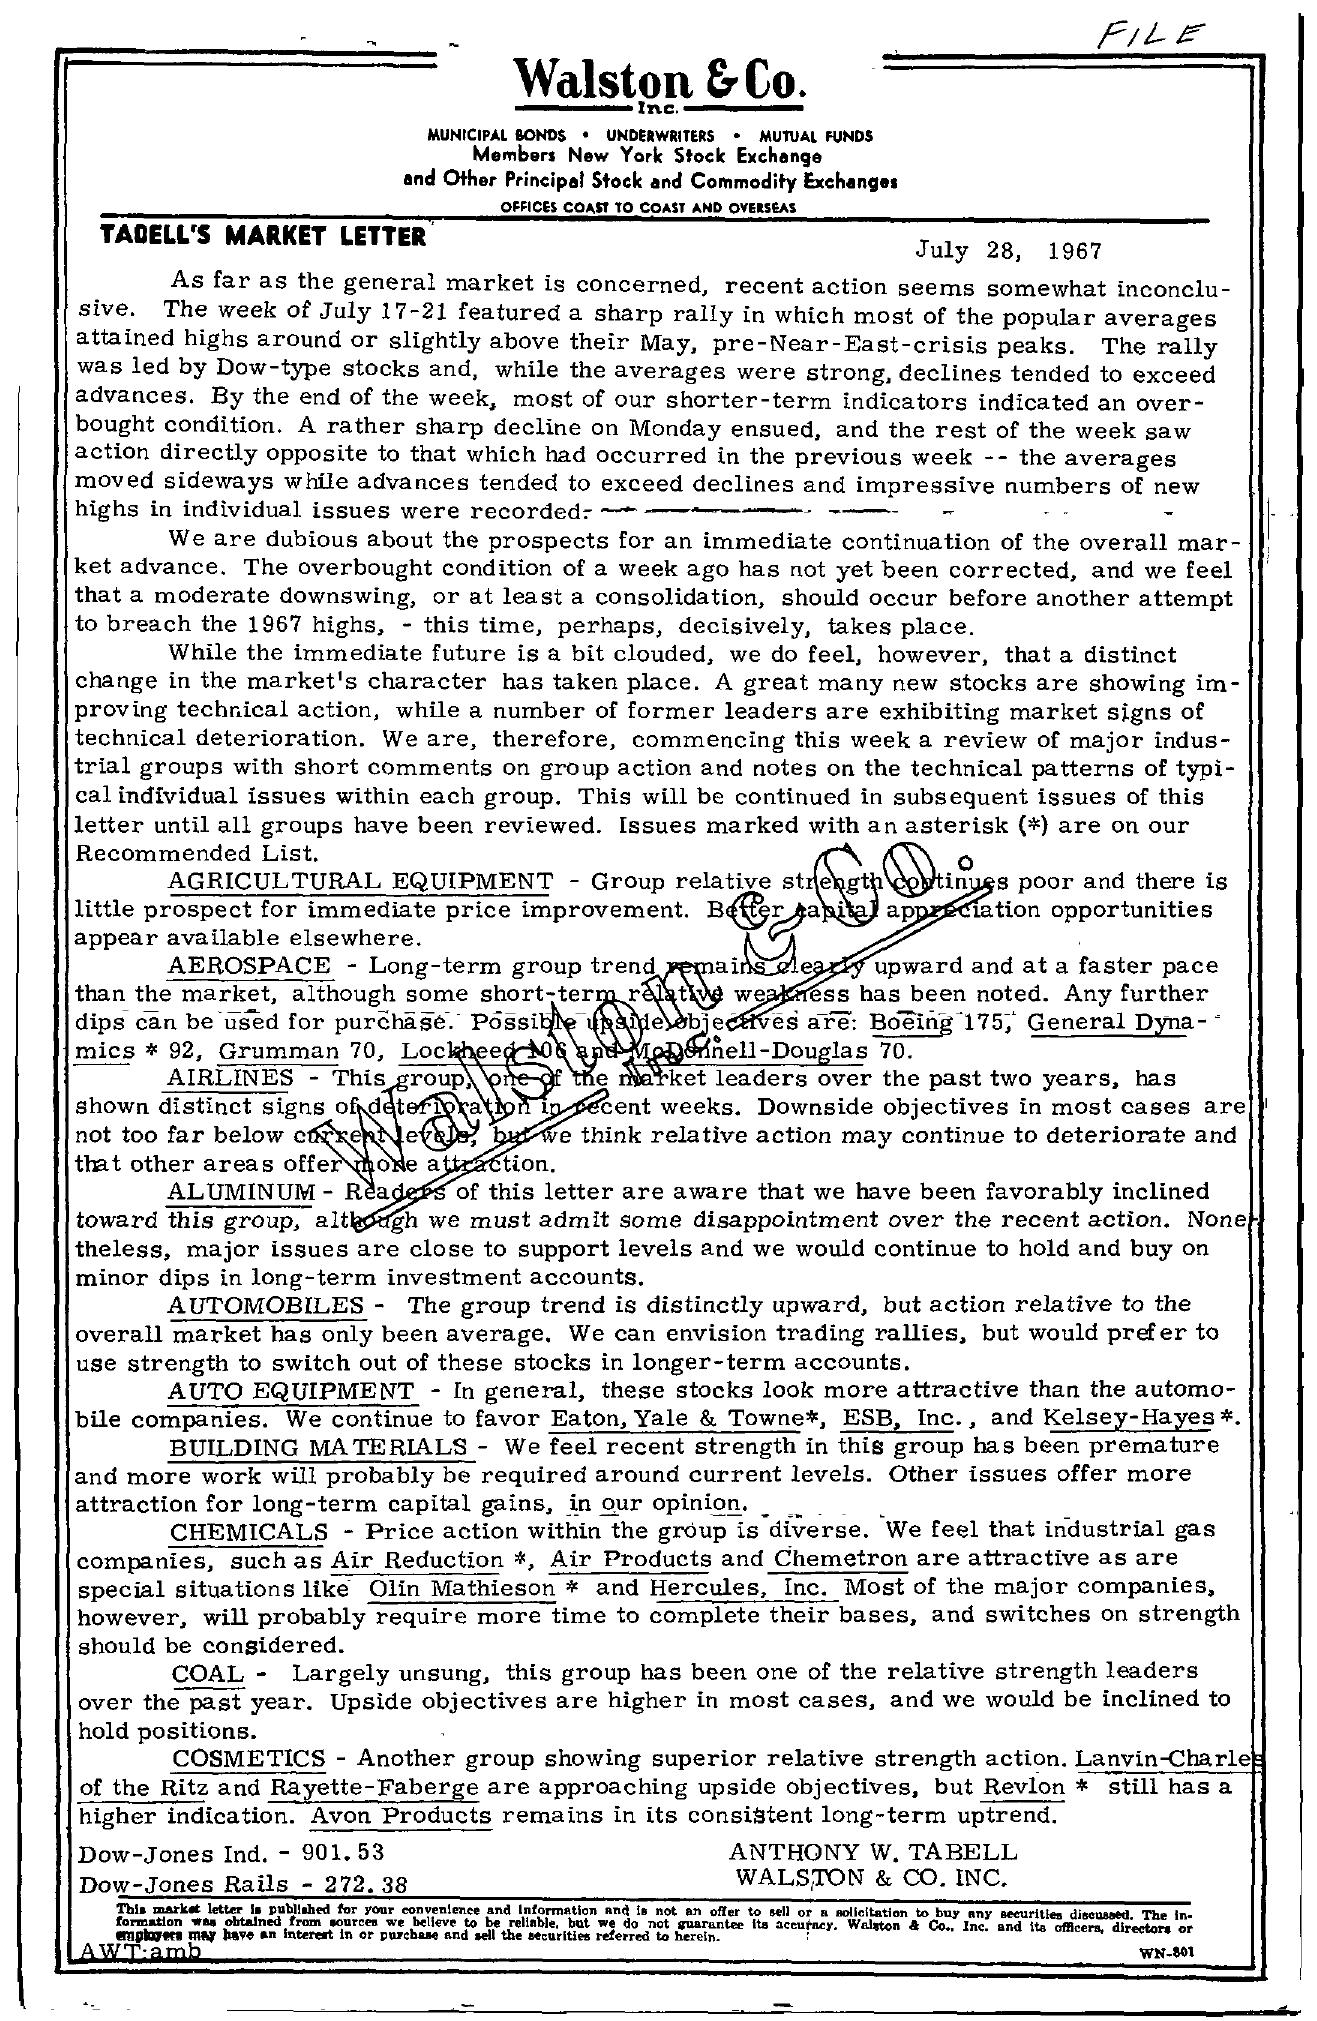 Tabell's Market Letter - July 28, 1967